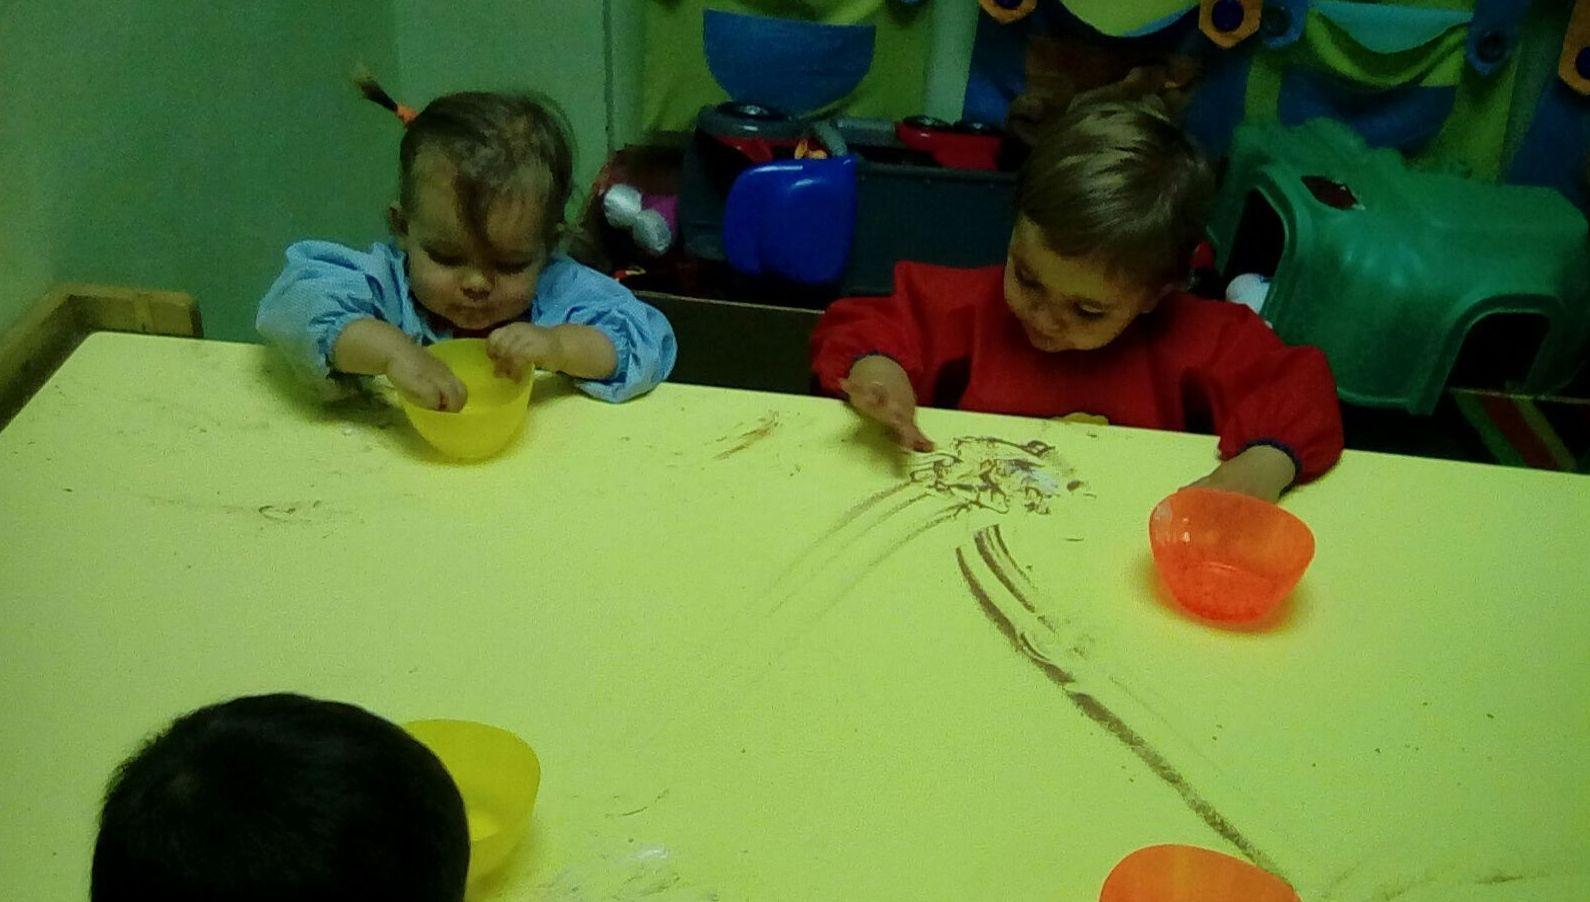 Foto 28 de Escuela infantil en Algete   E.I. Cuatro Pecas de Colores